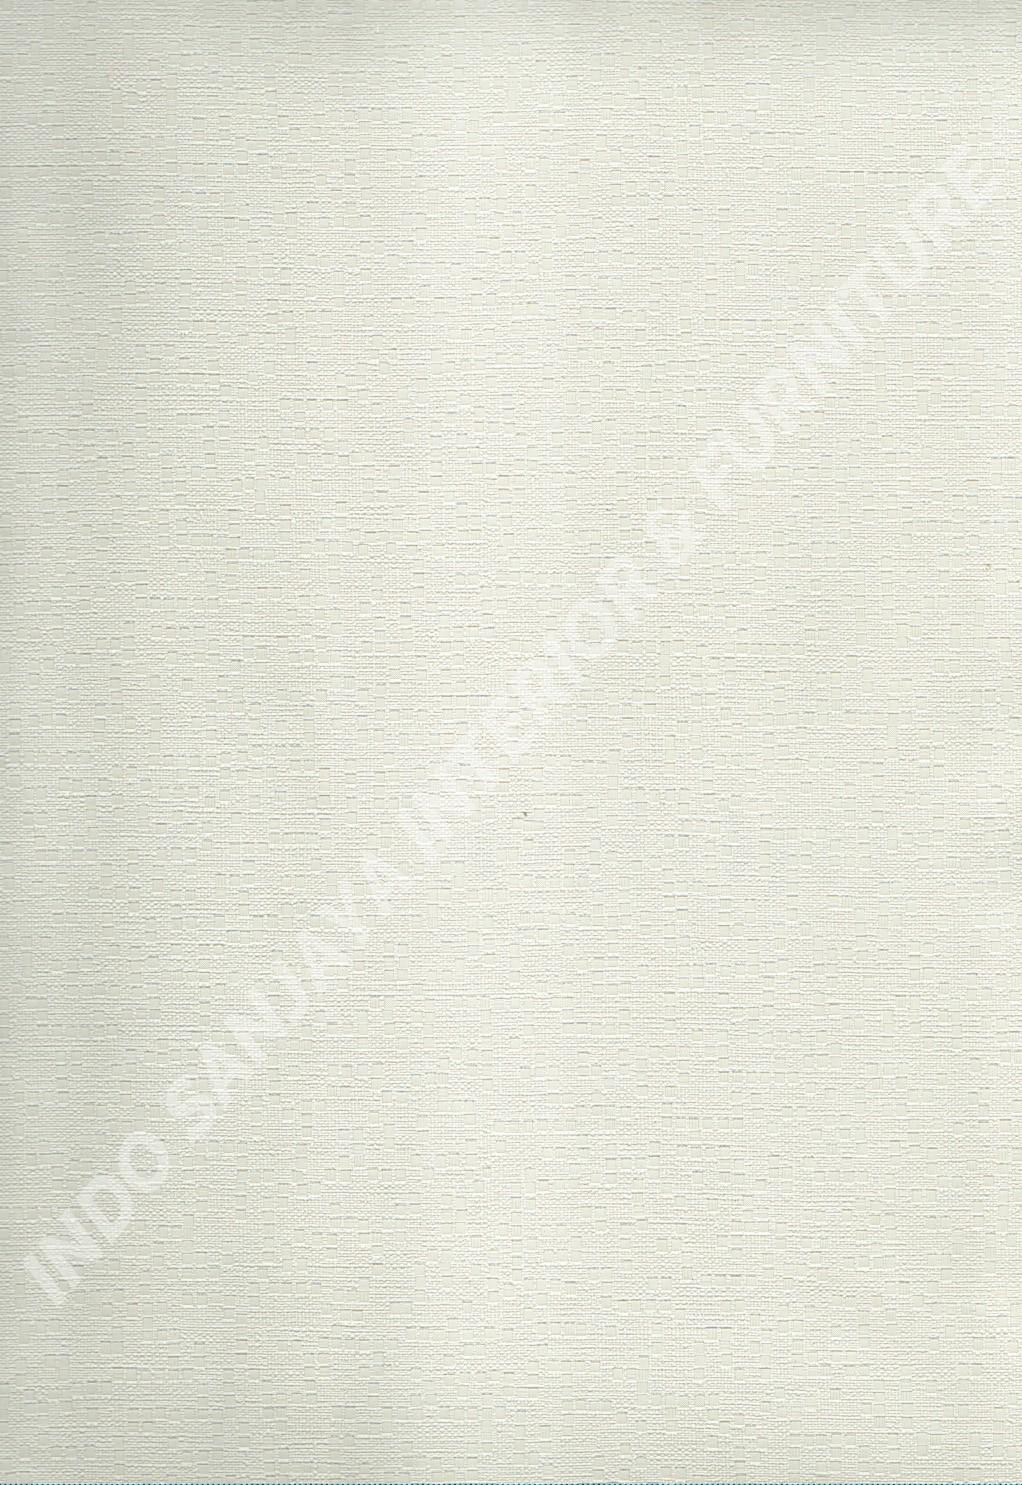 wallpaper MOKO:3062 corak Minimalis / Polos warna Abu-Abu